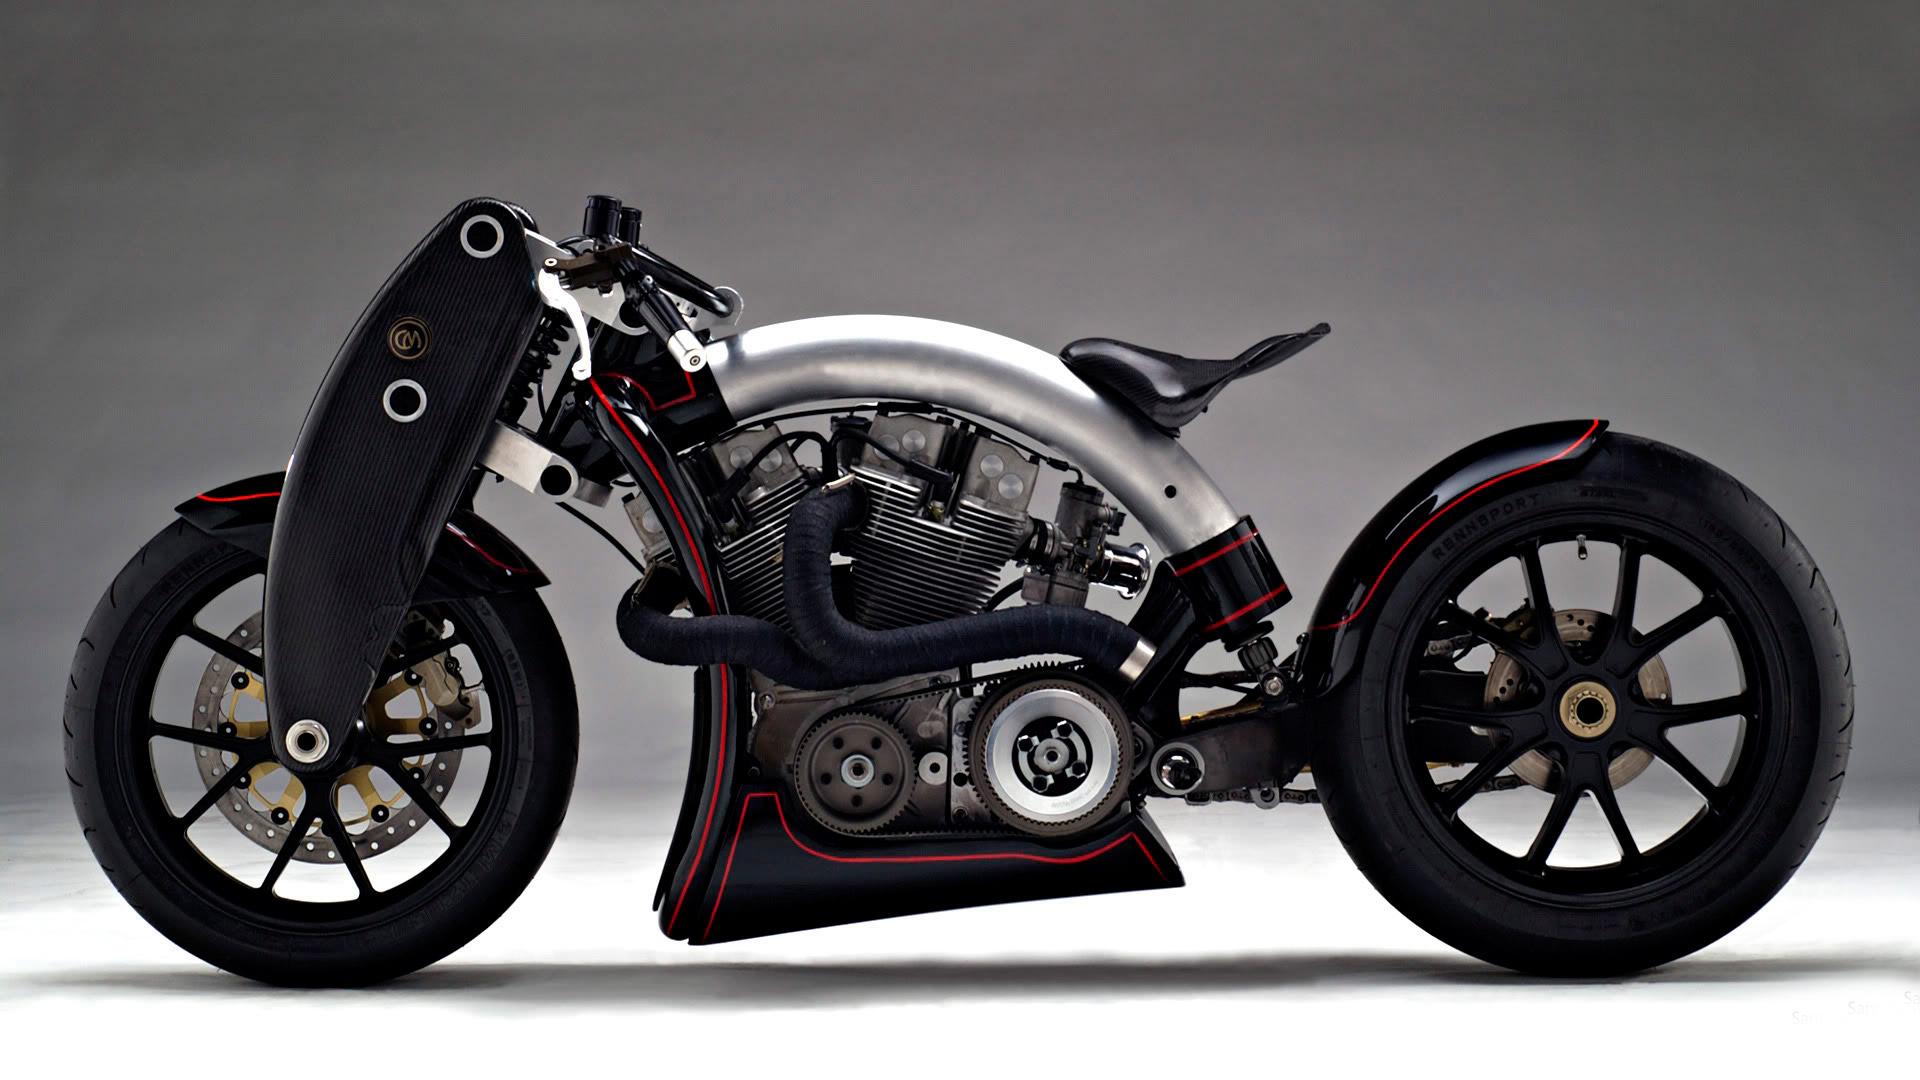 New Hd Bike Top 25 Most Beautiful And Dashing Suzuki Motorcycle Hd 1920x1080 Wallpaper Teahub Io